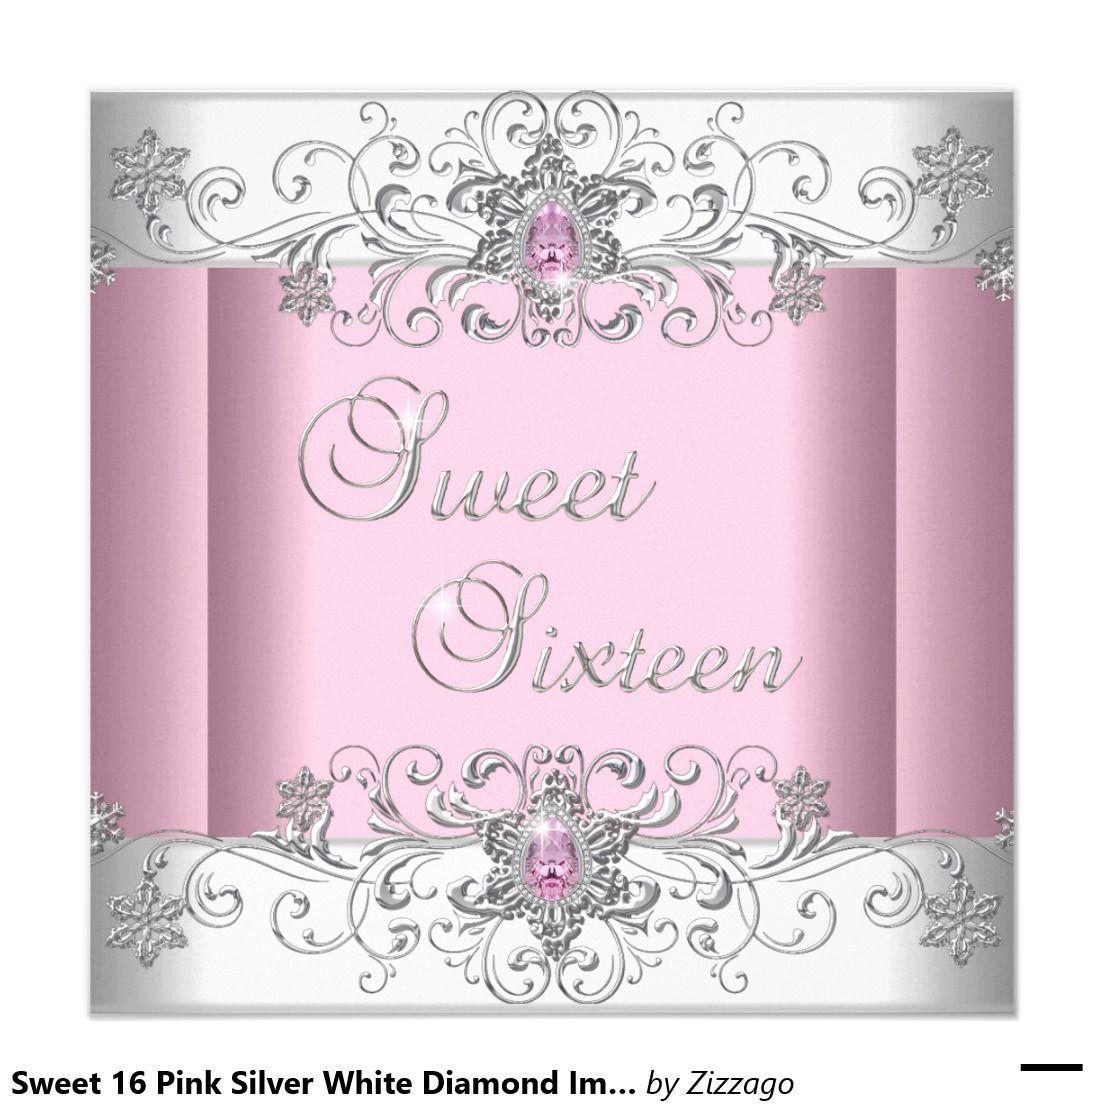 Sweet 16 Pink Silver White Diamond Image Party Invitation | White ...